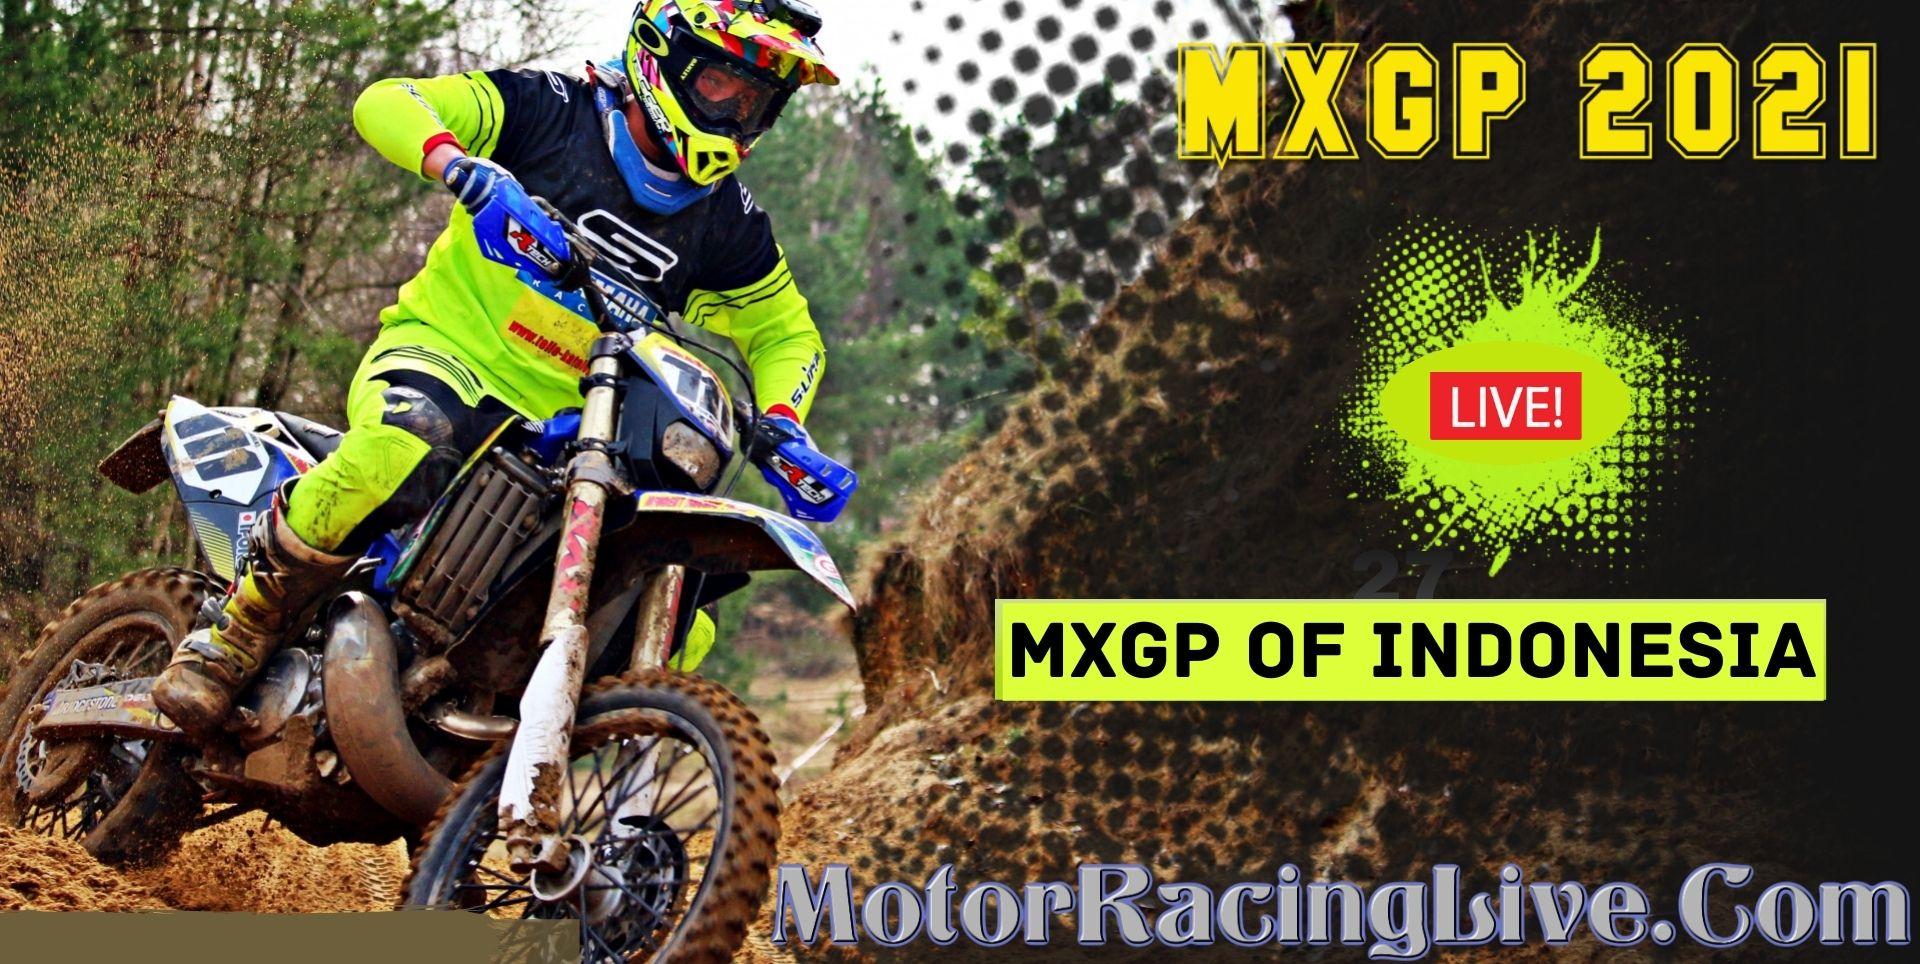 MXGP OF INDONESIA 2021 Live Stream